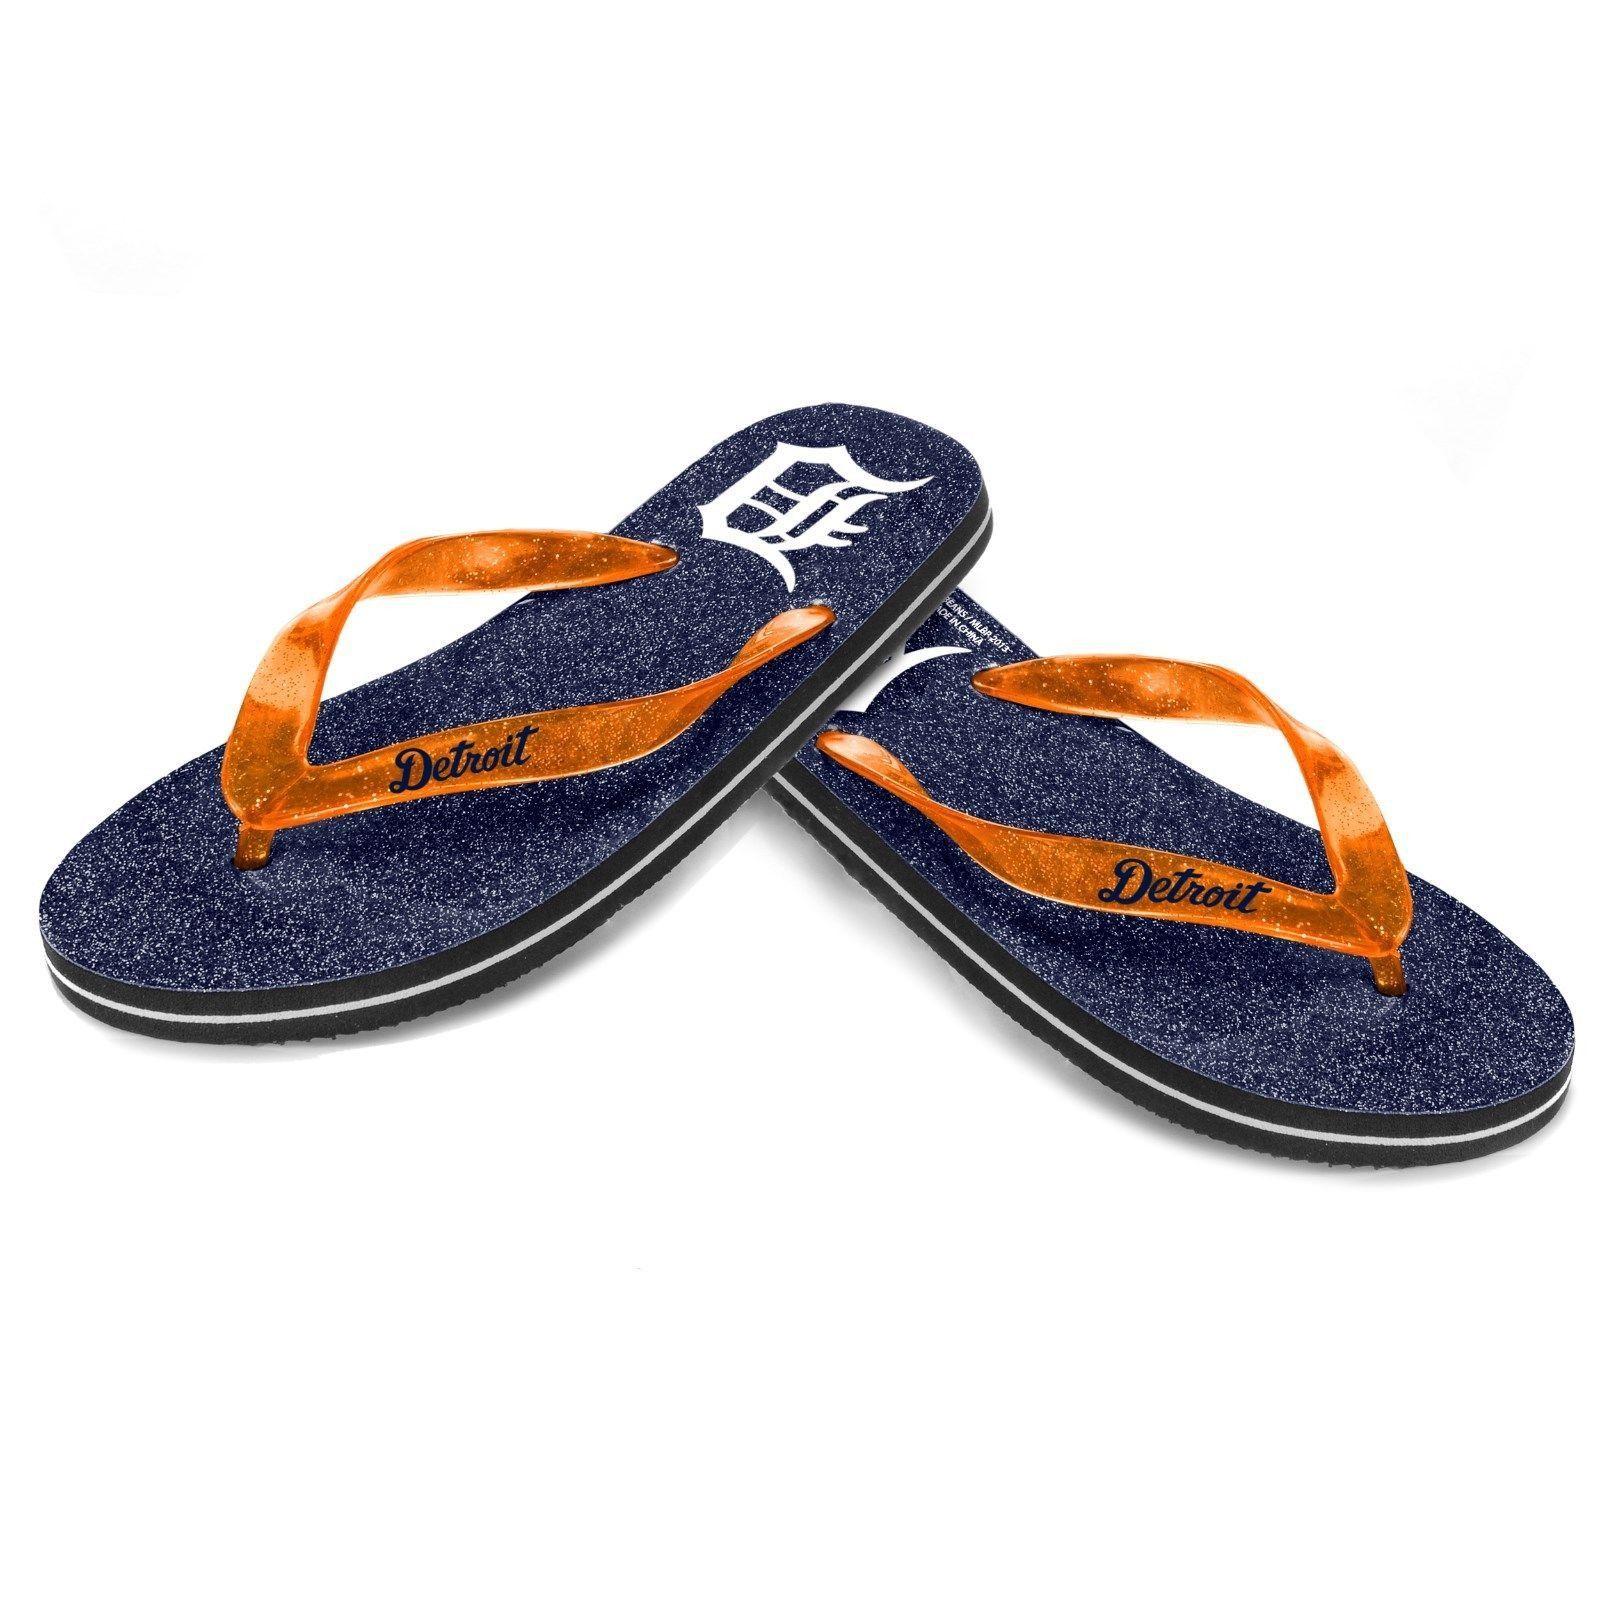 Detroit Tigers Women's Glitter Flip Flop Sandals